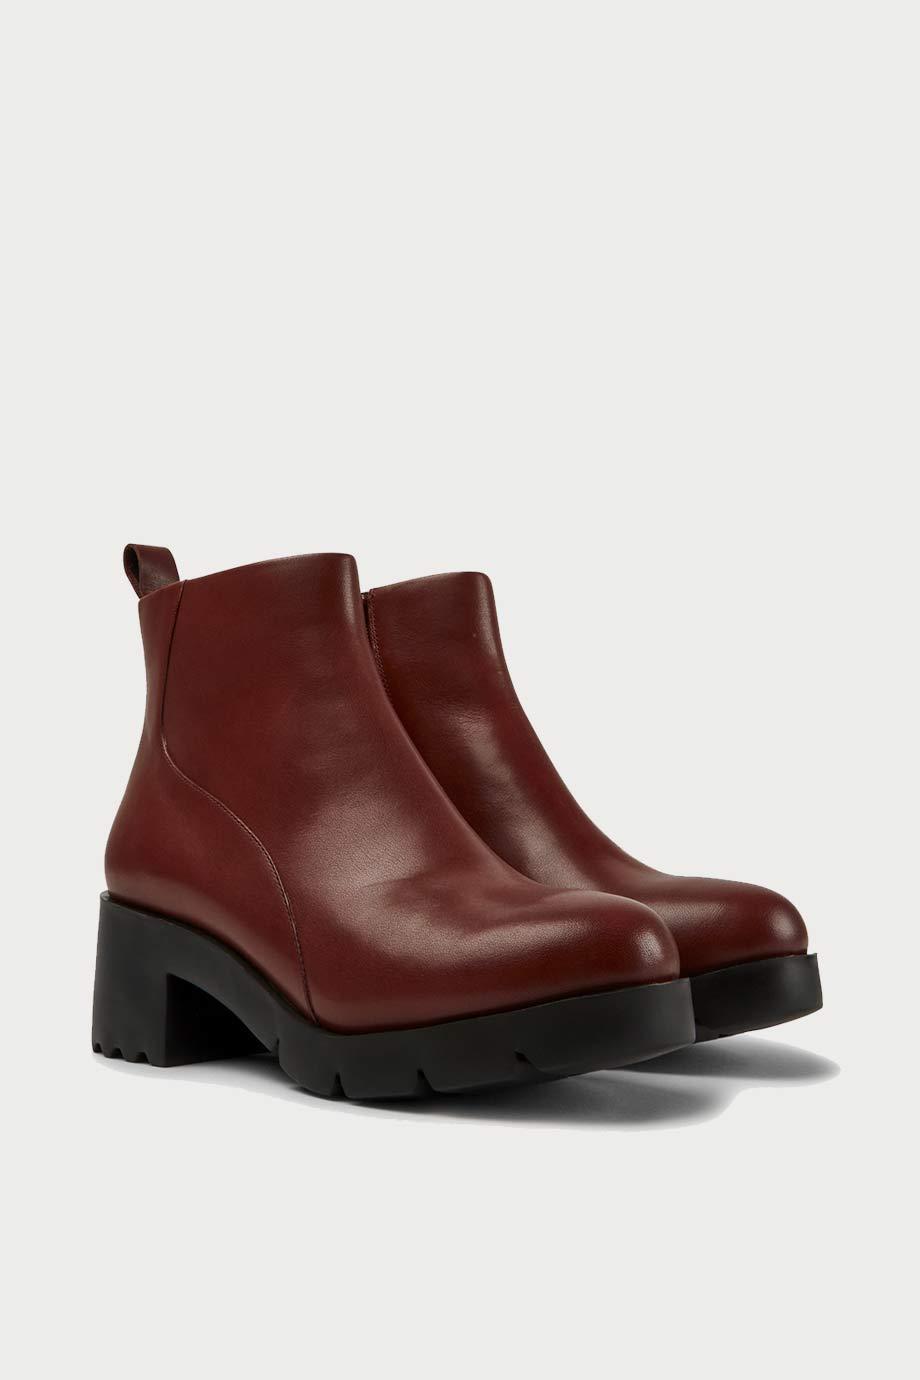 spiridoula metheniti shoes xalkida p K400228 007 camper 2